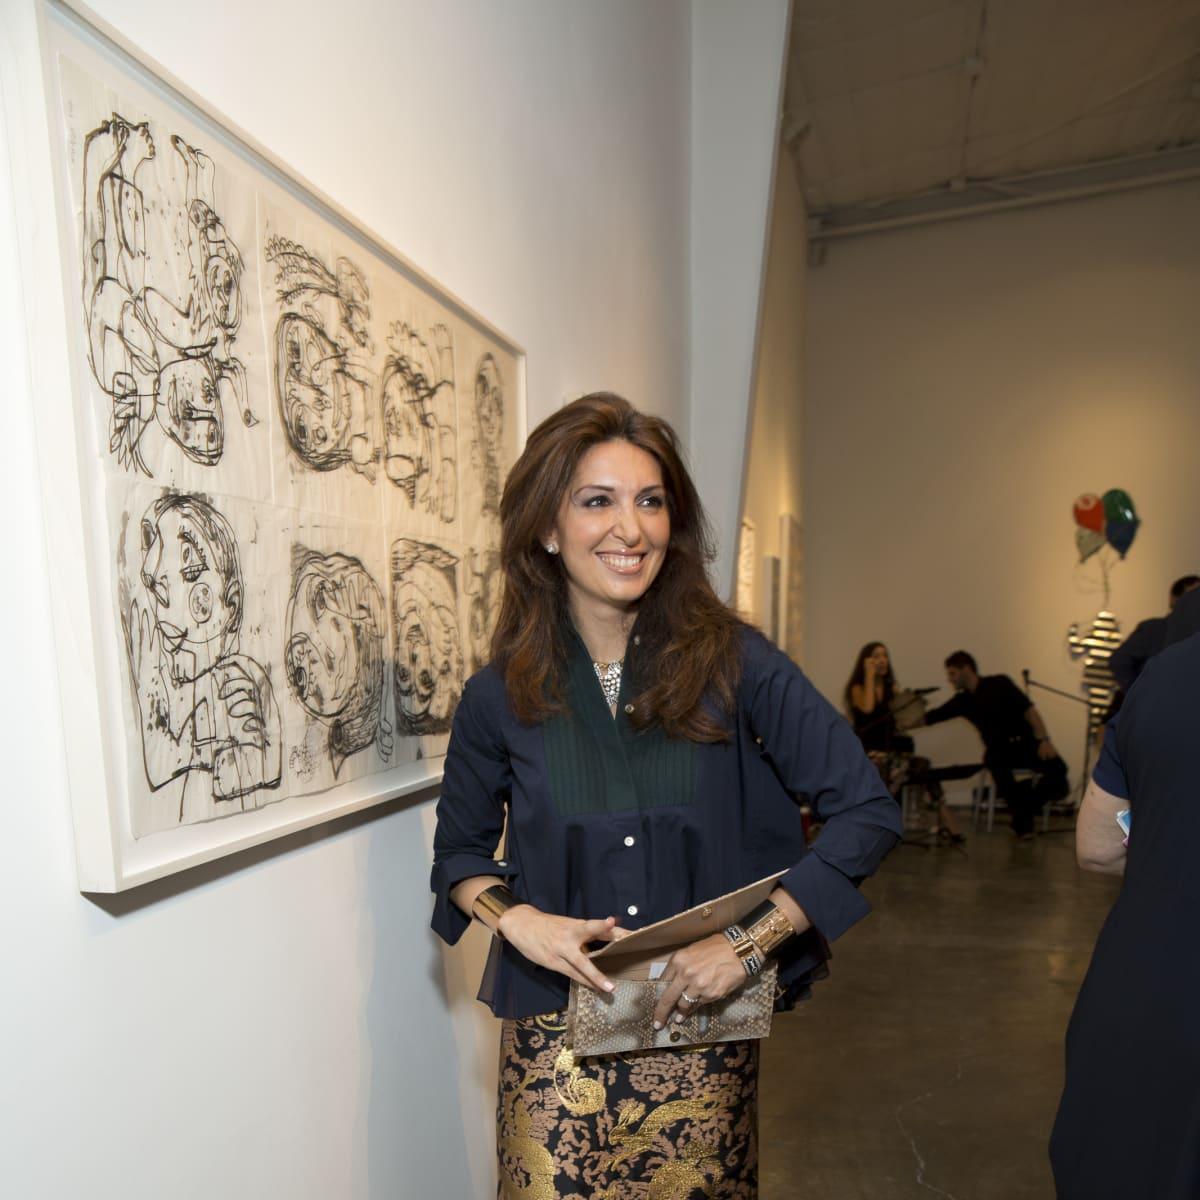 UNICEF Art Auction, 5/16  Fay Zakhem